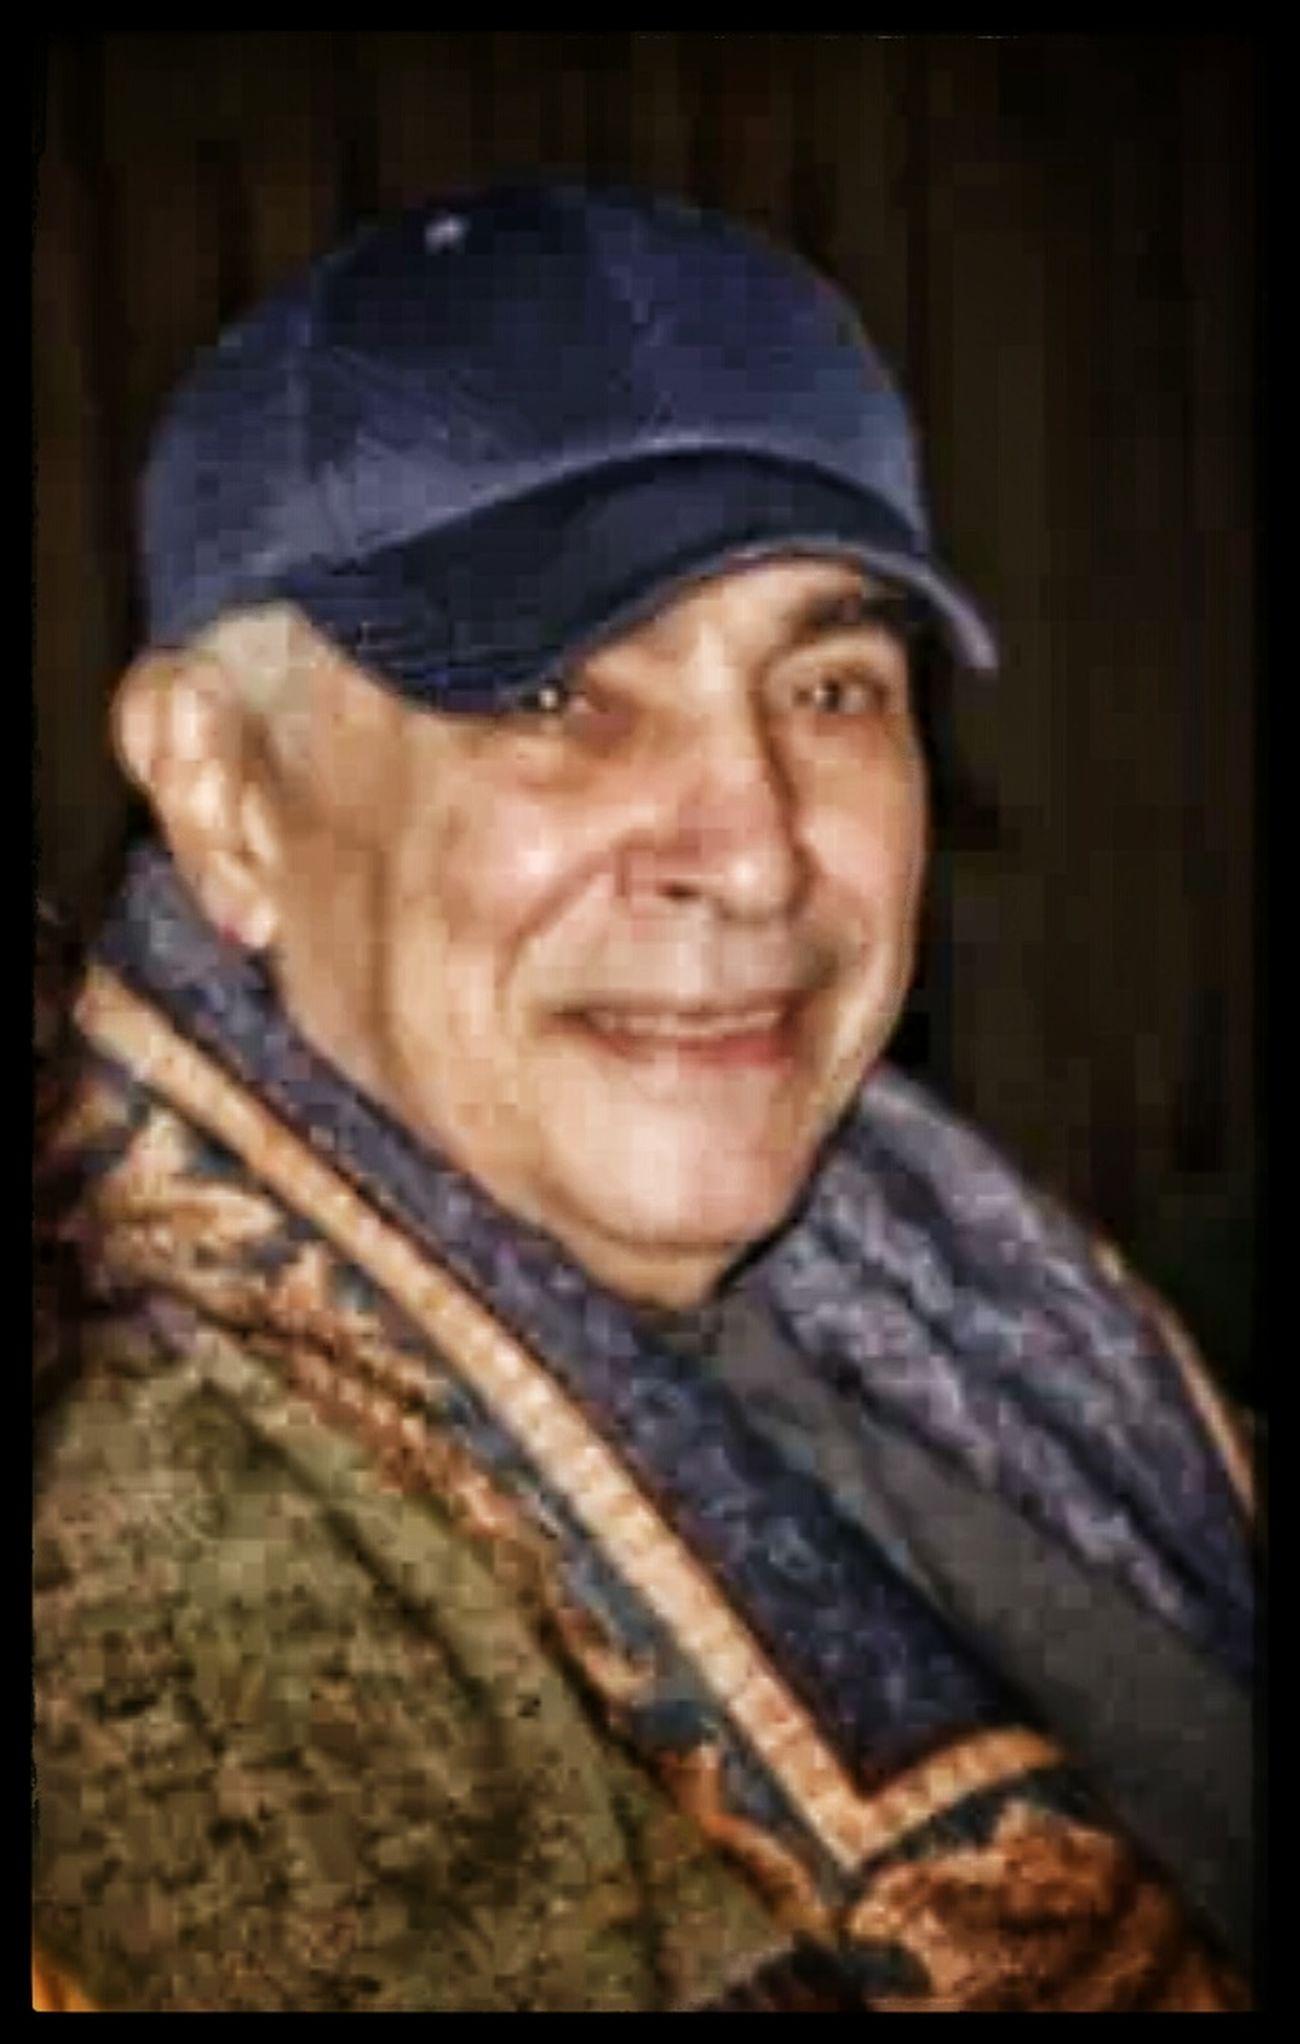 RIP PAPI CHULO. Te Adoro Mi Biejo.. la bendicion, Papi !!